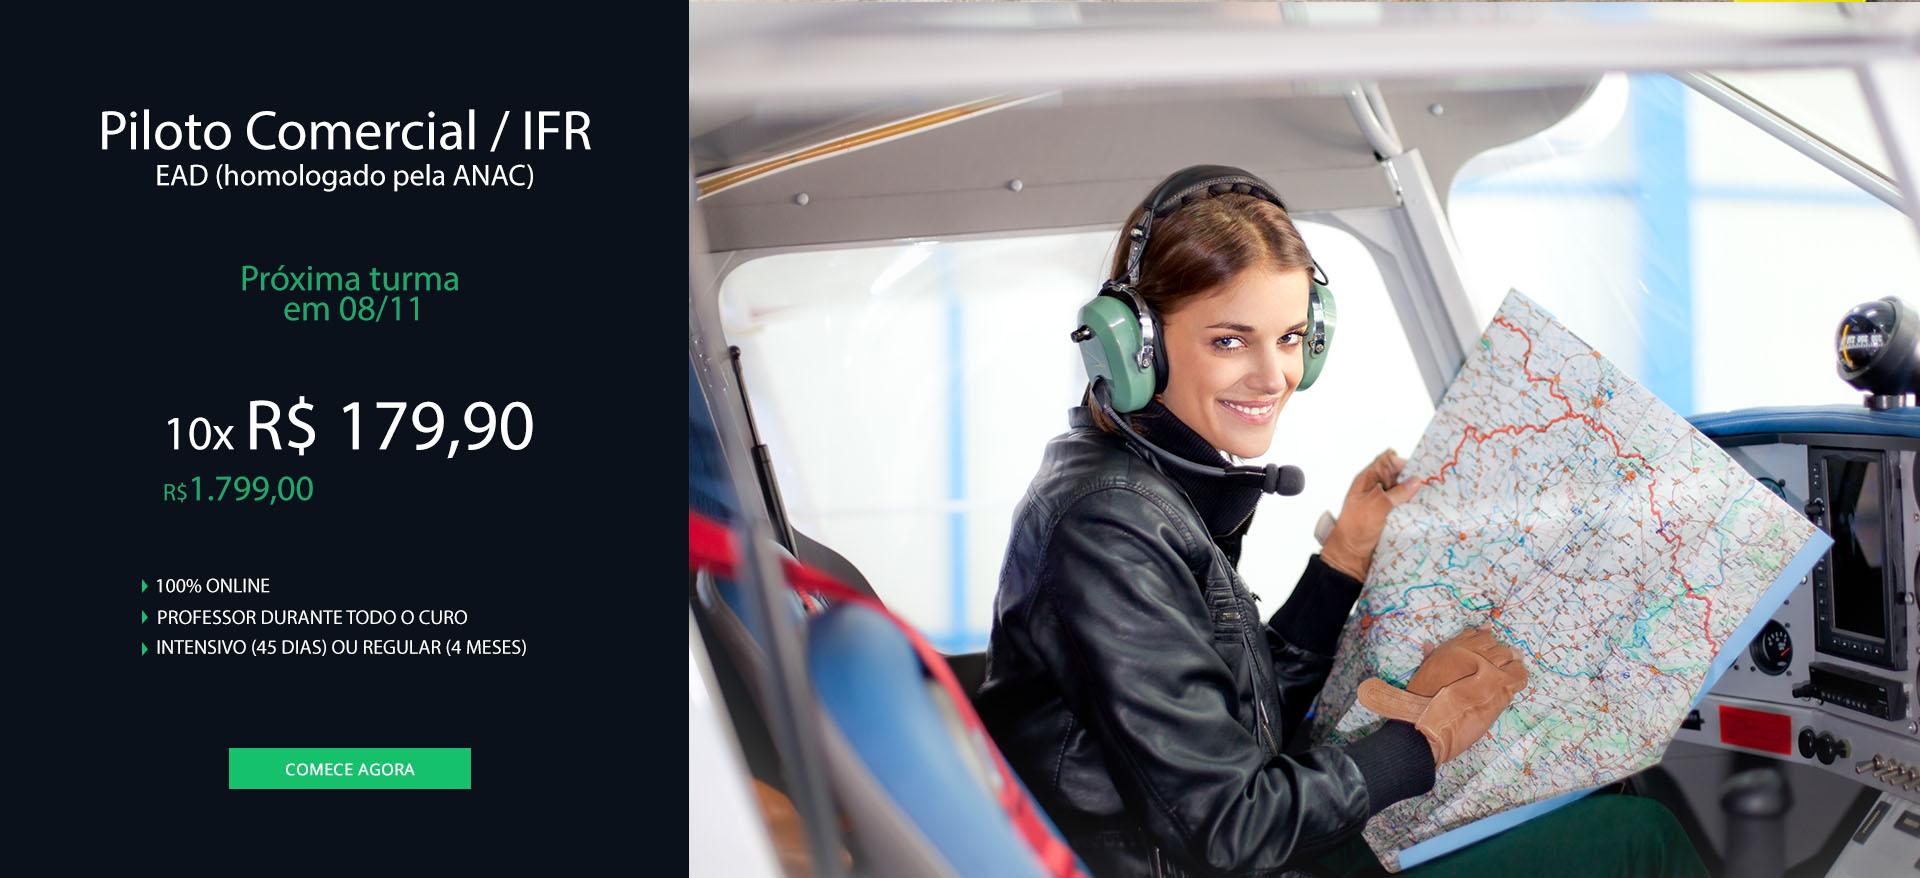 Piloto Comercial eBianch